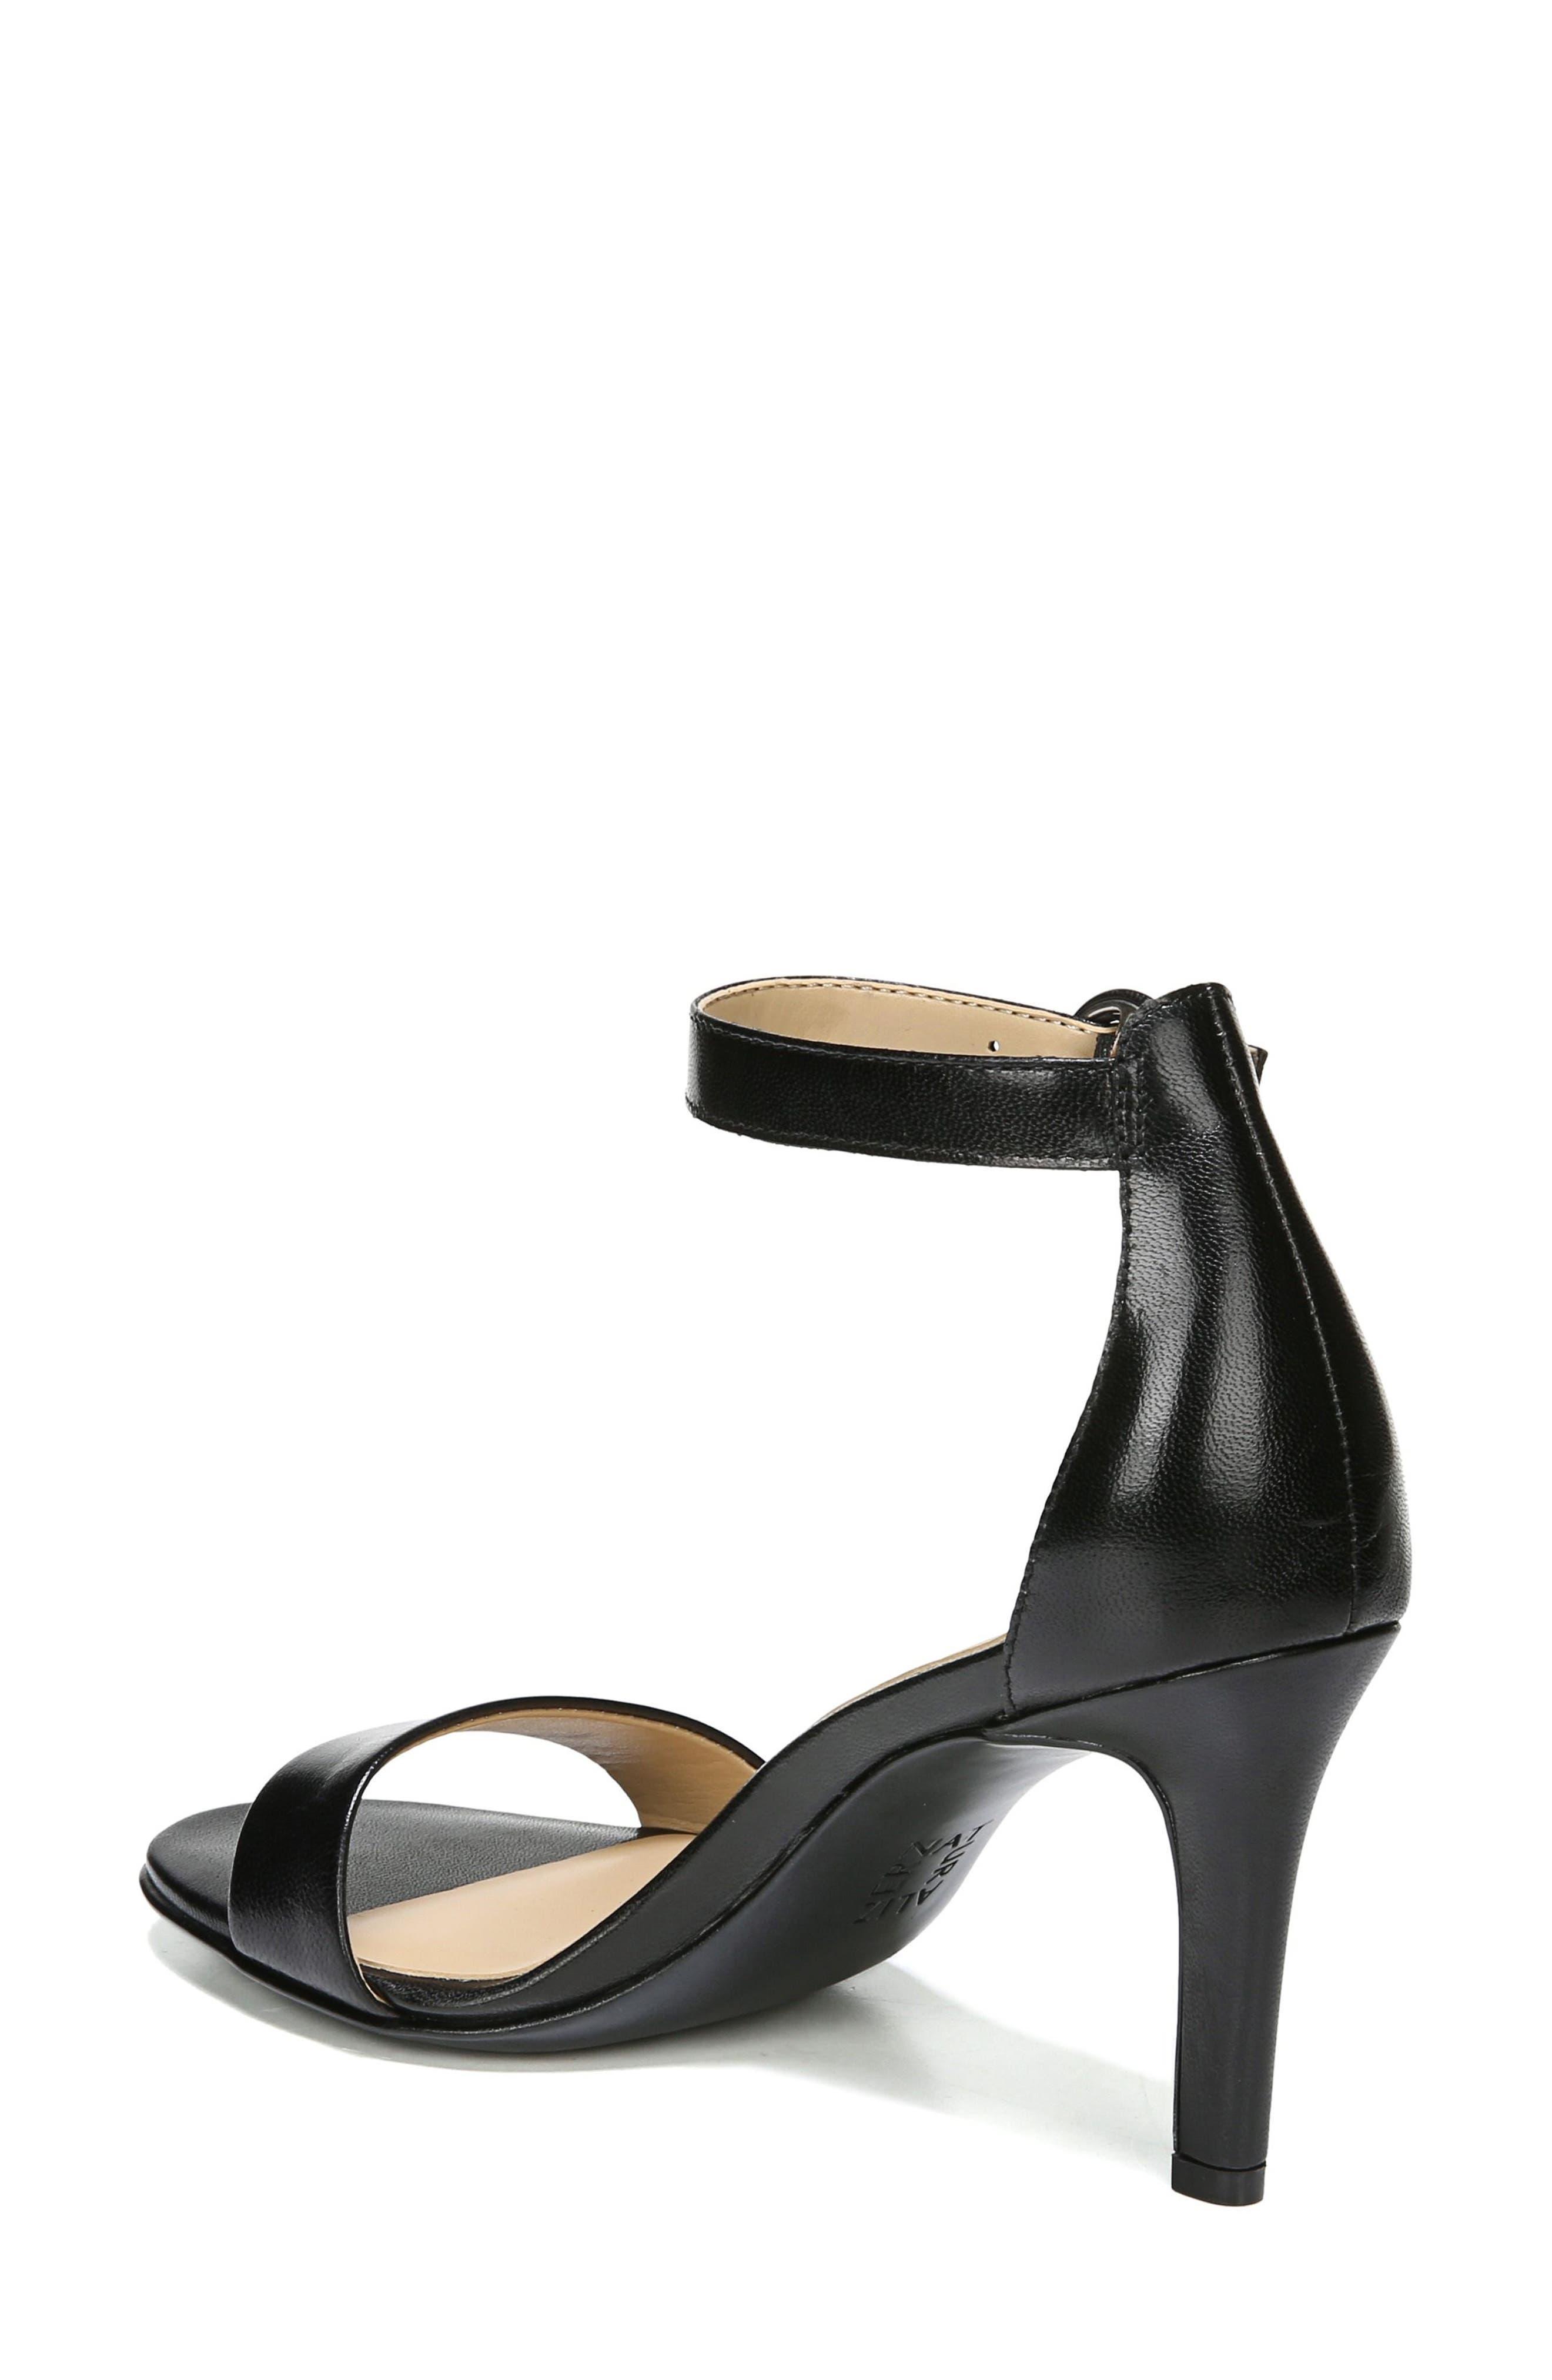 NATURALIZER, Kinsley Ankle Strap Sandal, Alternate thumbnail 2, color, BLACK LEATHER